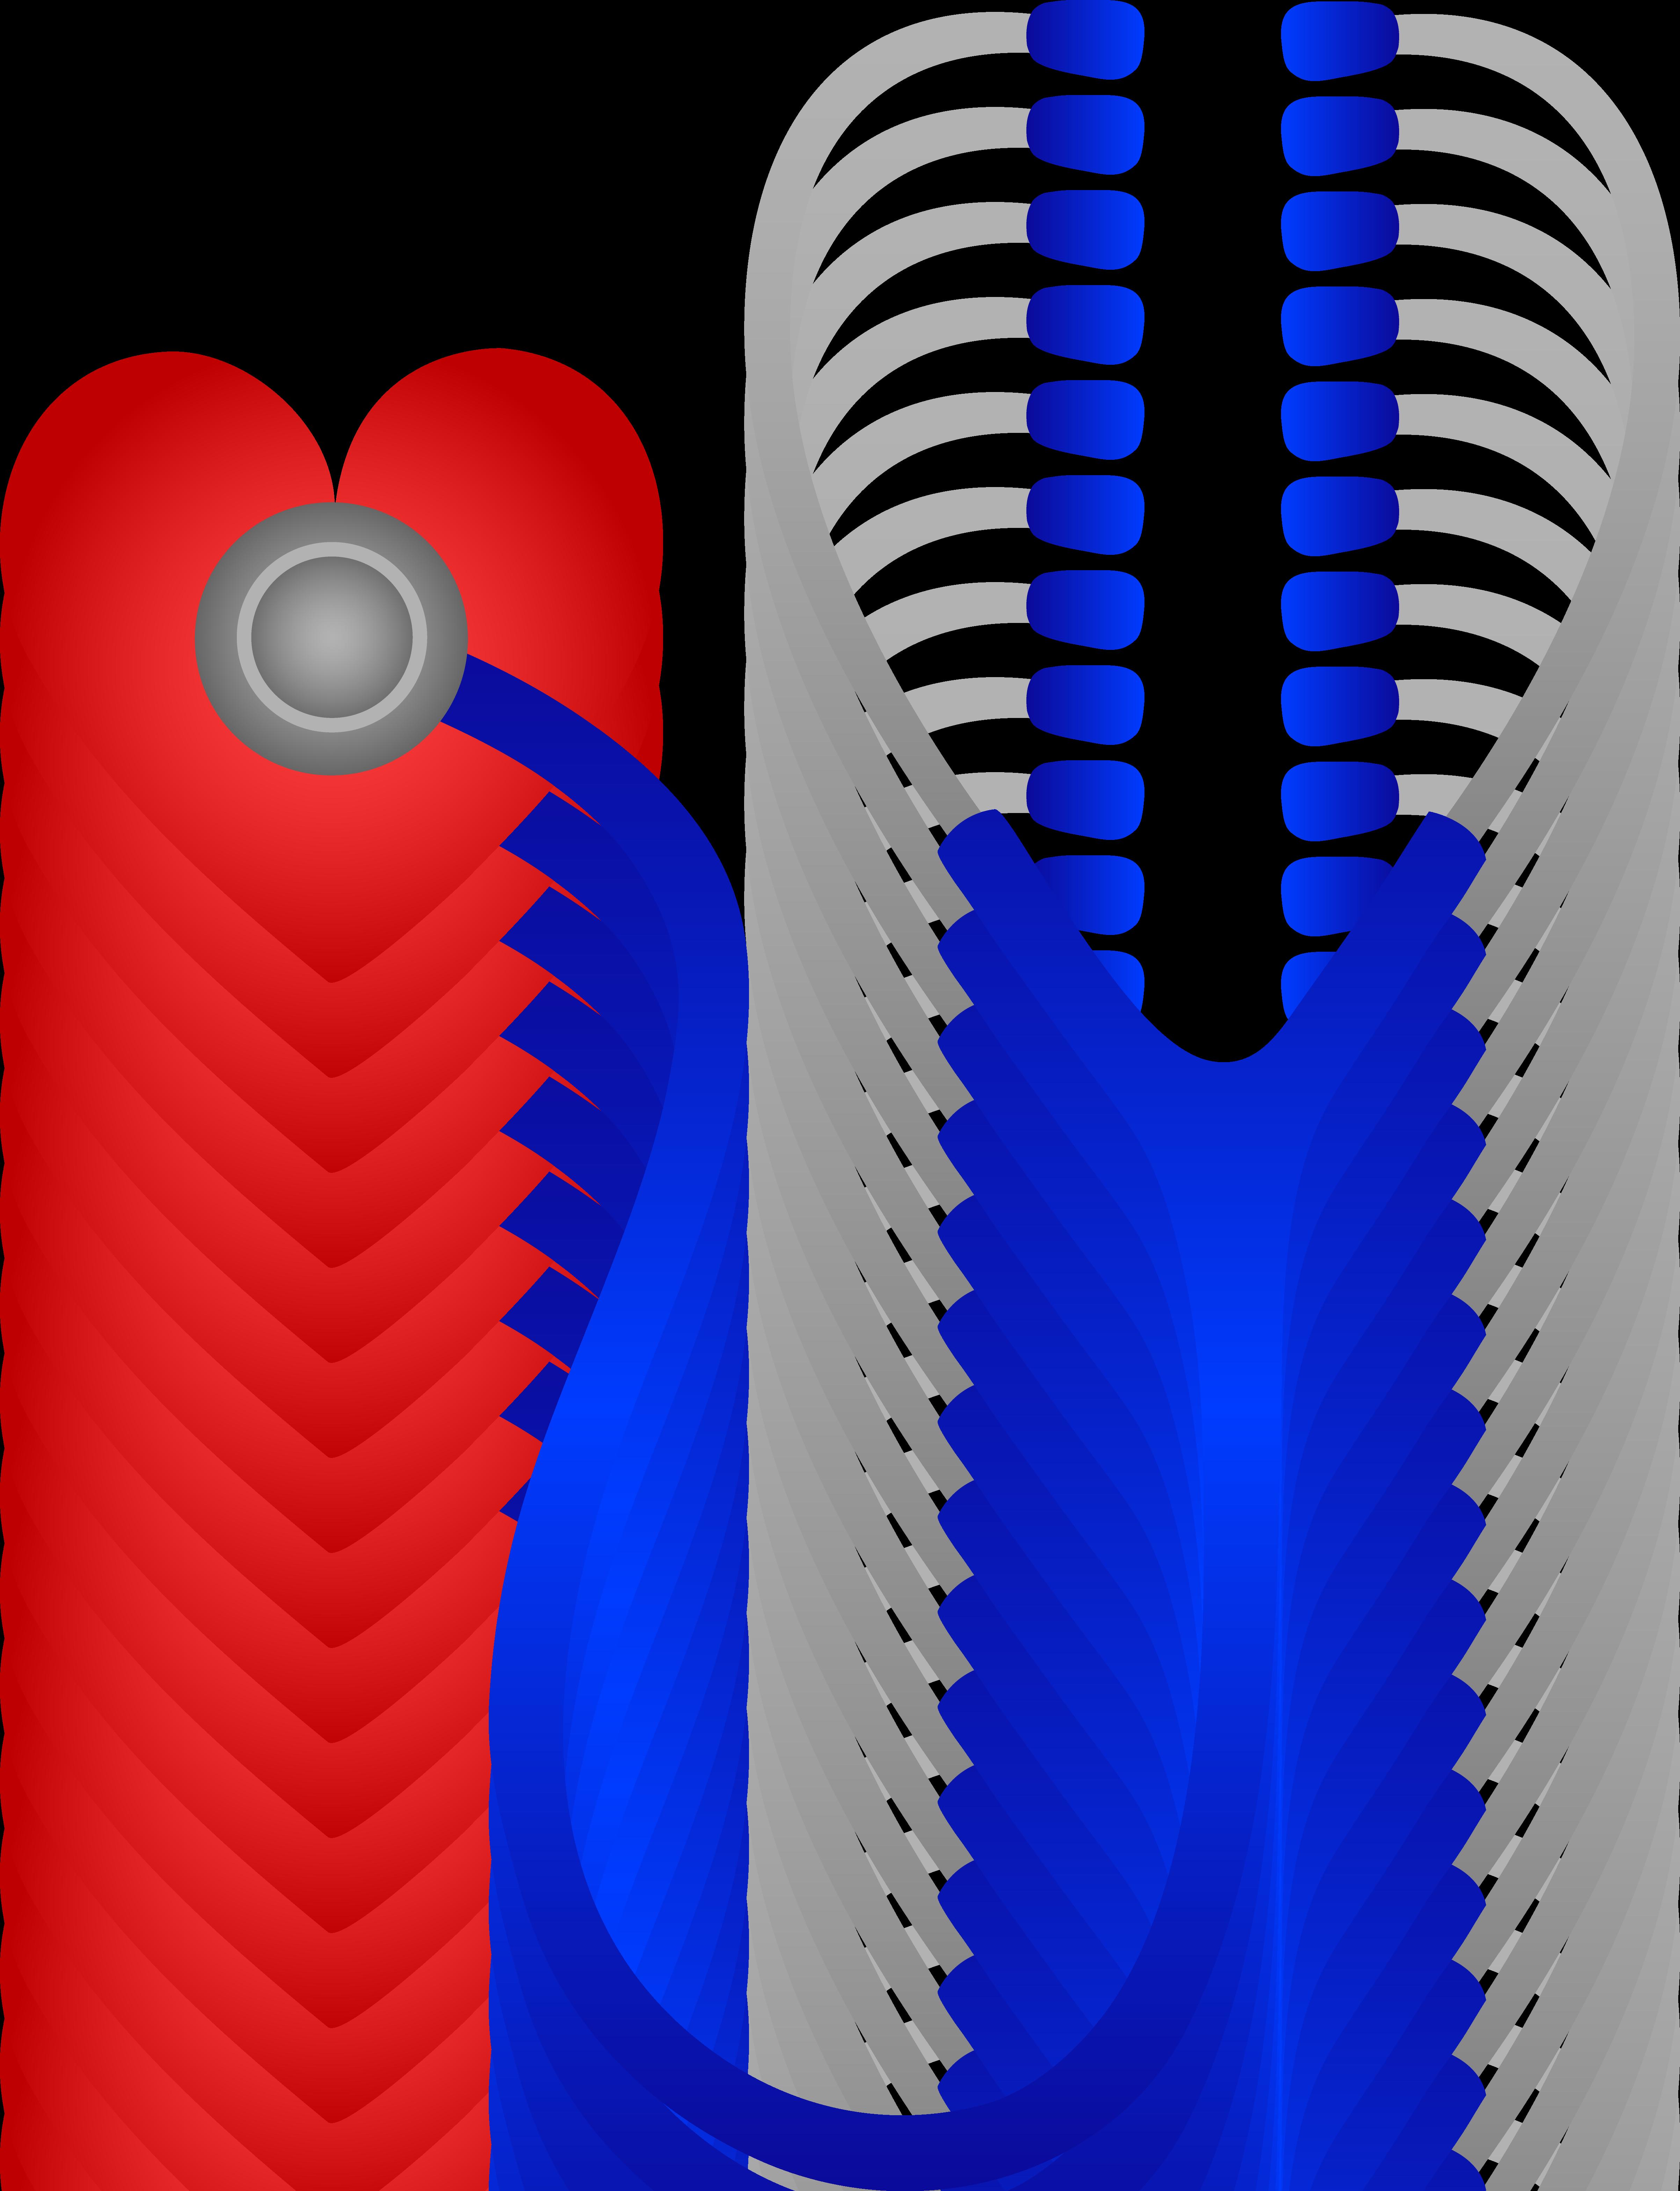 4809x6271 Stethoscope Listening To Heart Beat